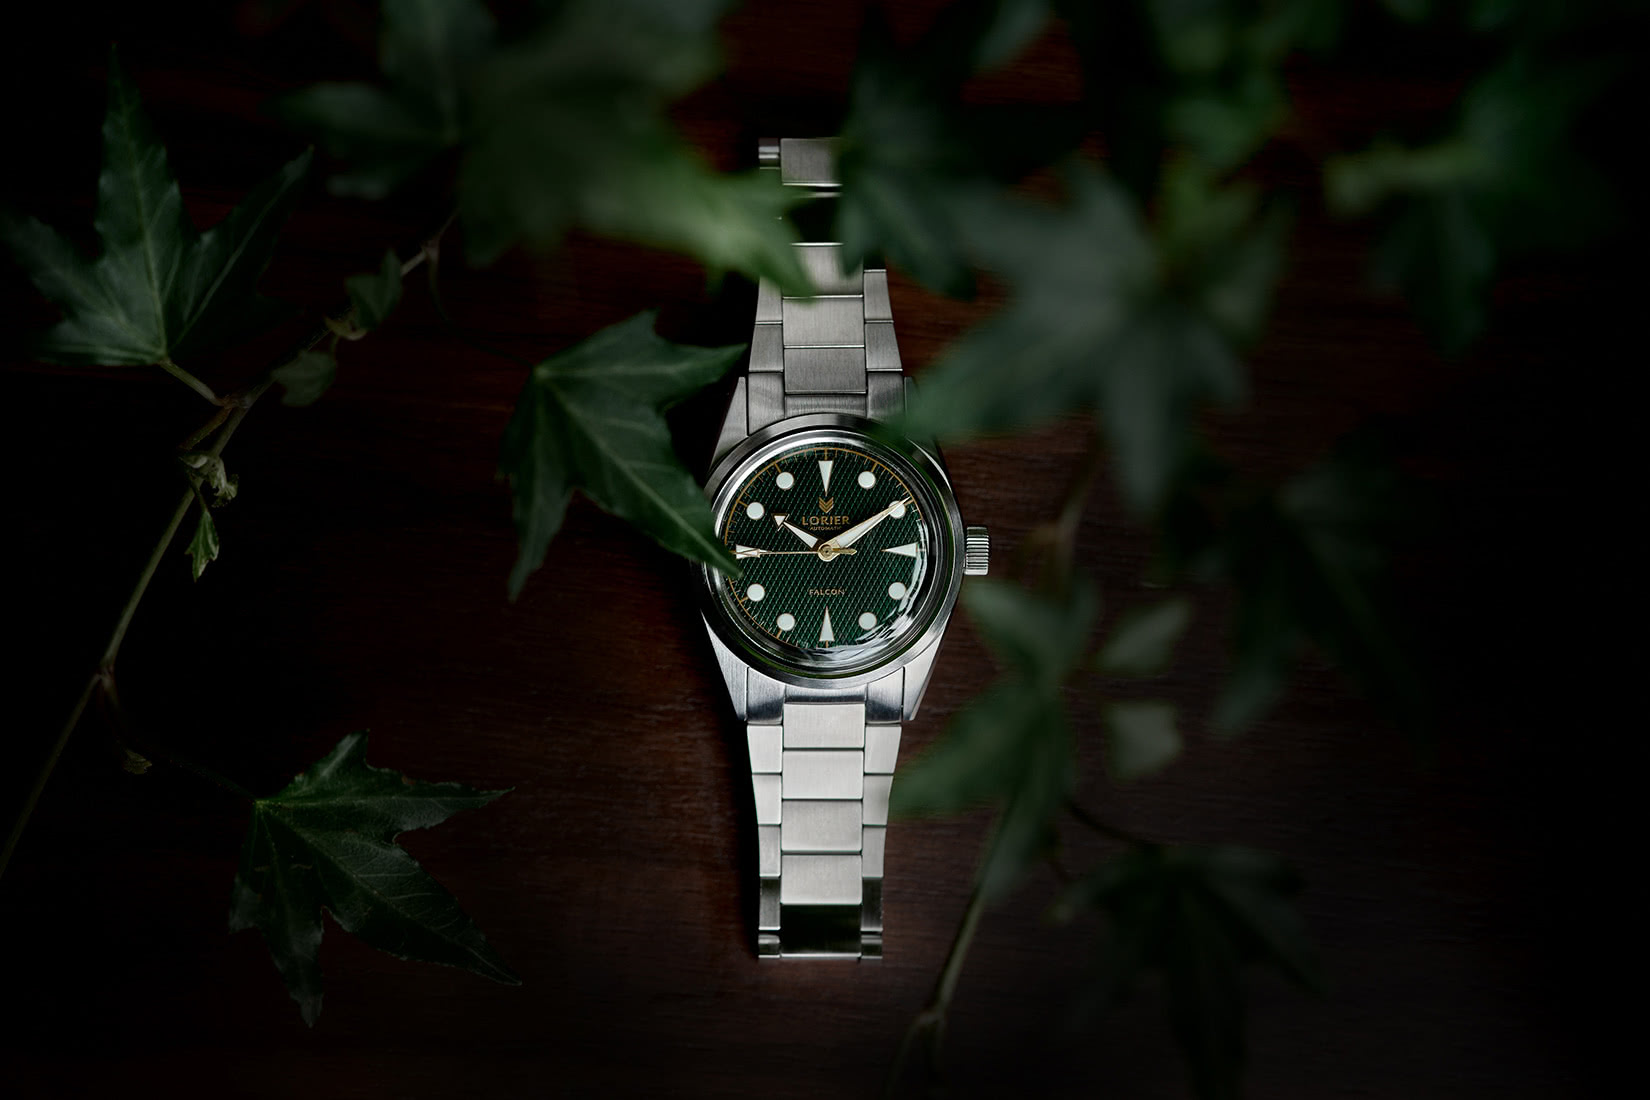 Lorier Watches founders Lauren Lorenzo Ortega interview GreenFalcon - Luxe Digital